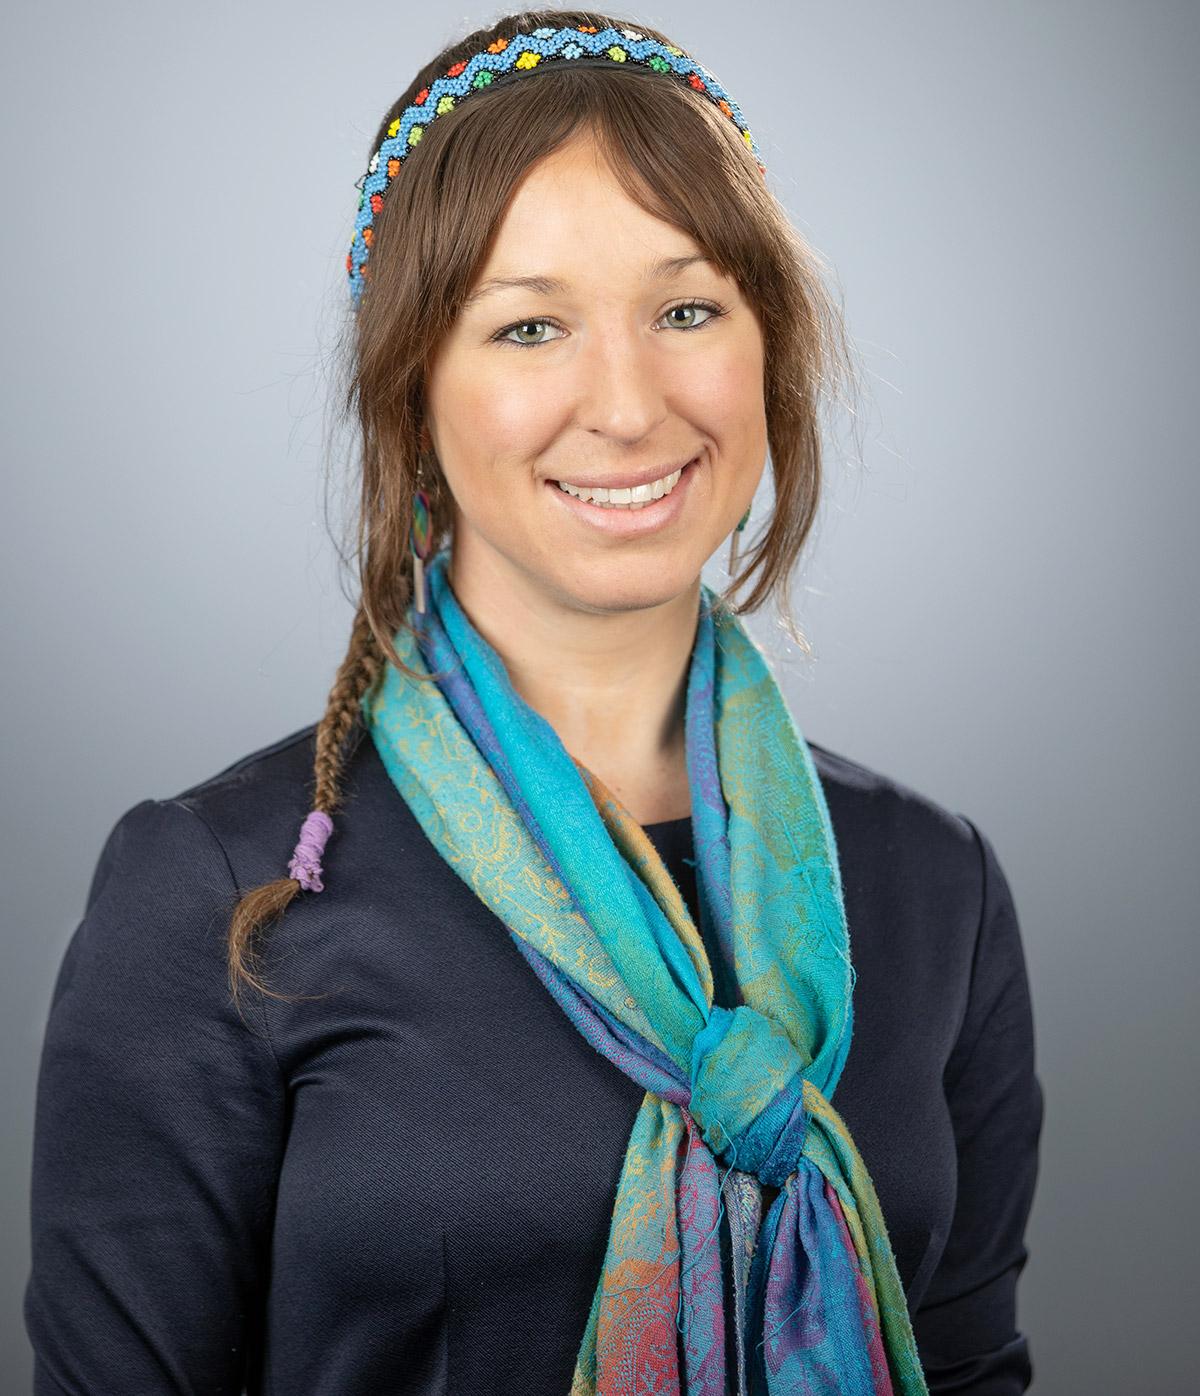 Michelle Doolan